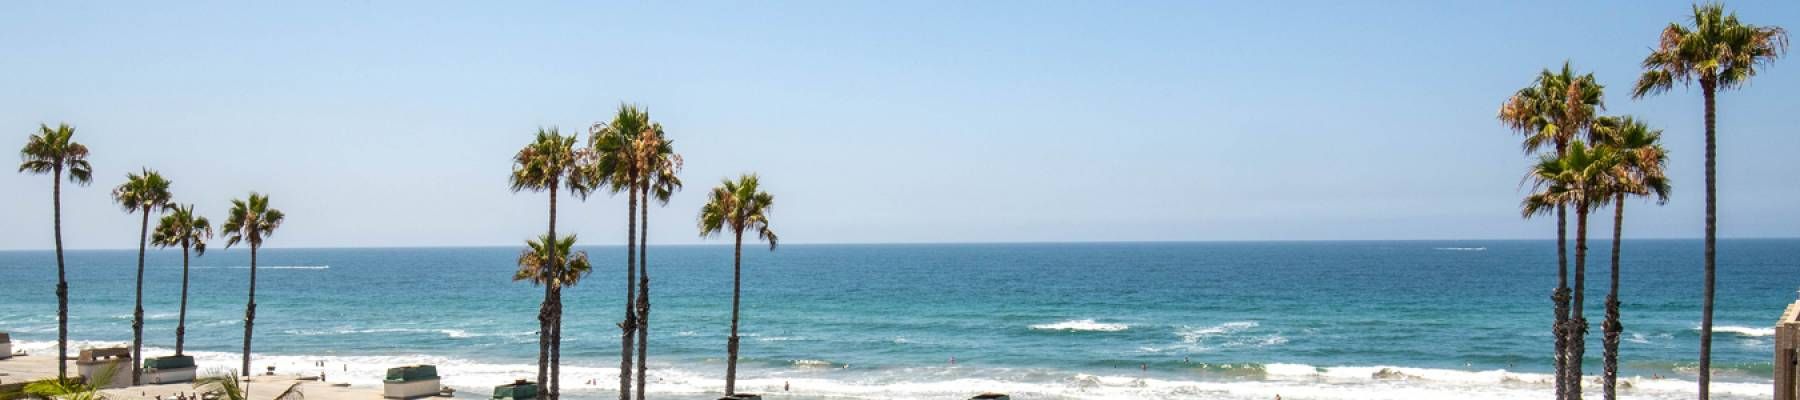 Beach Rentals Oceanside CA